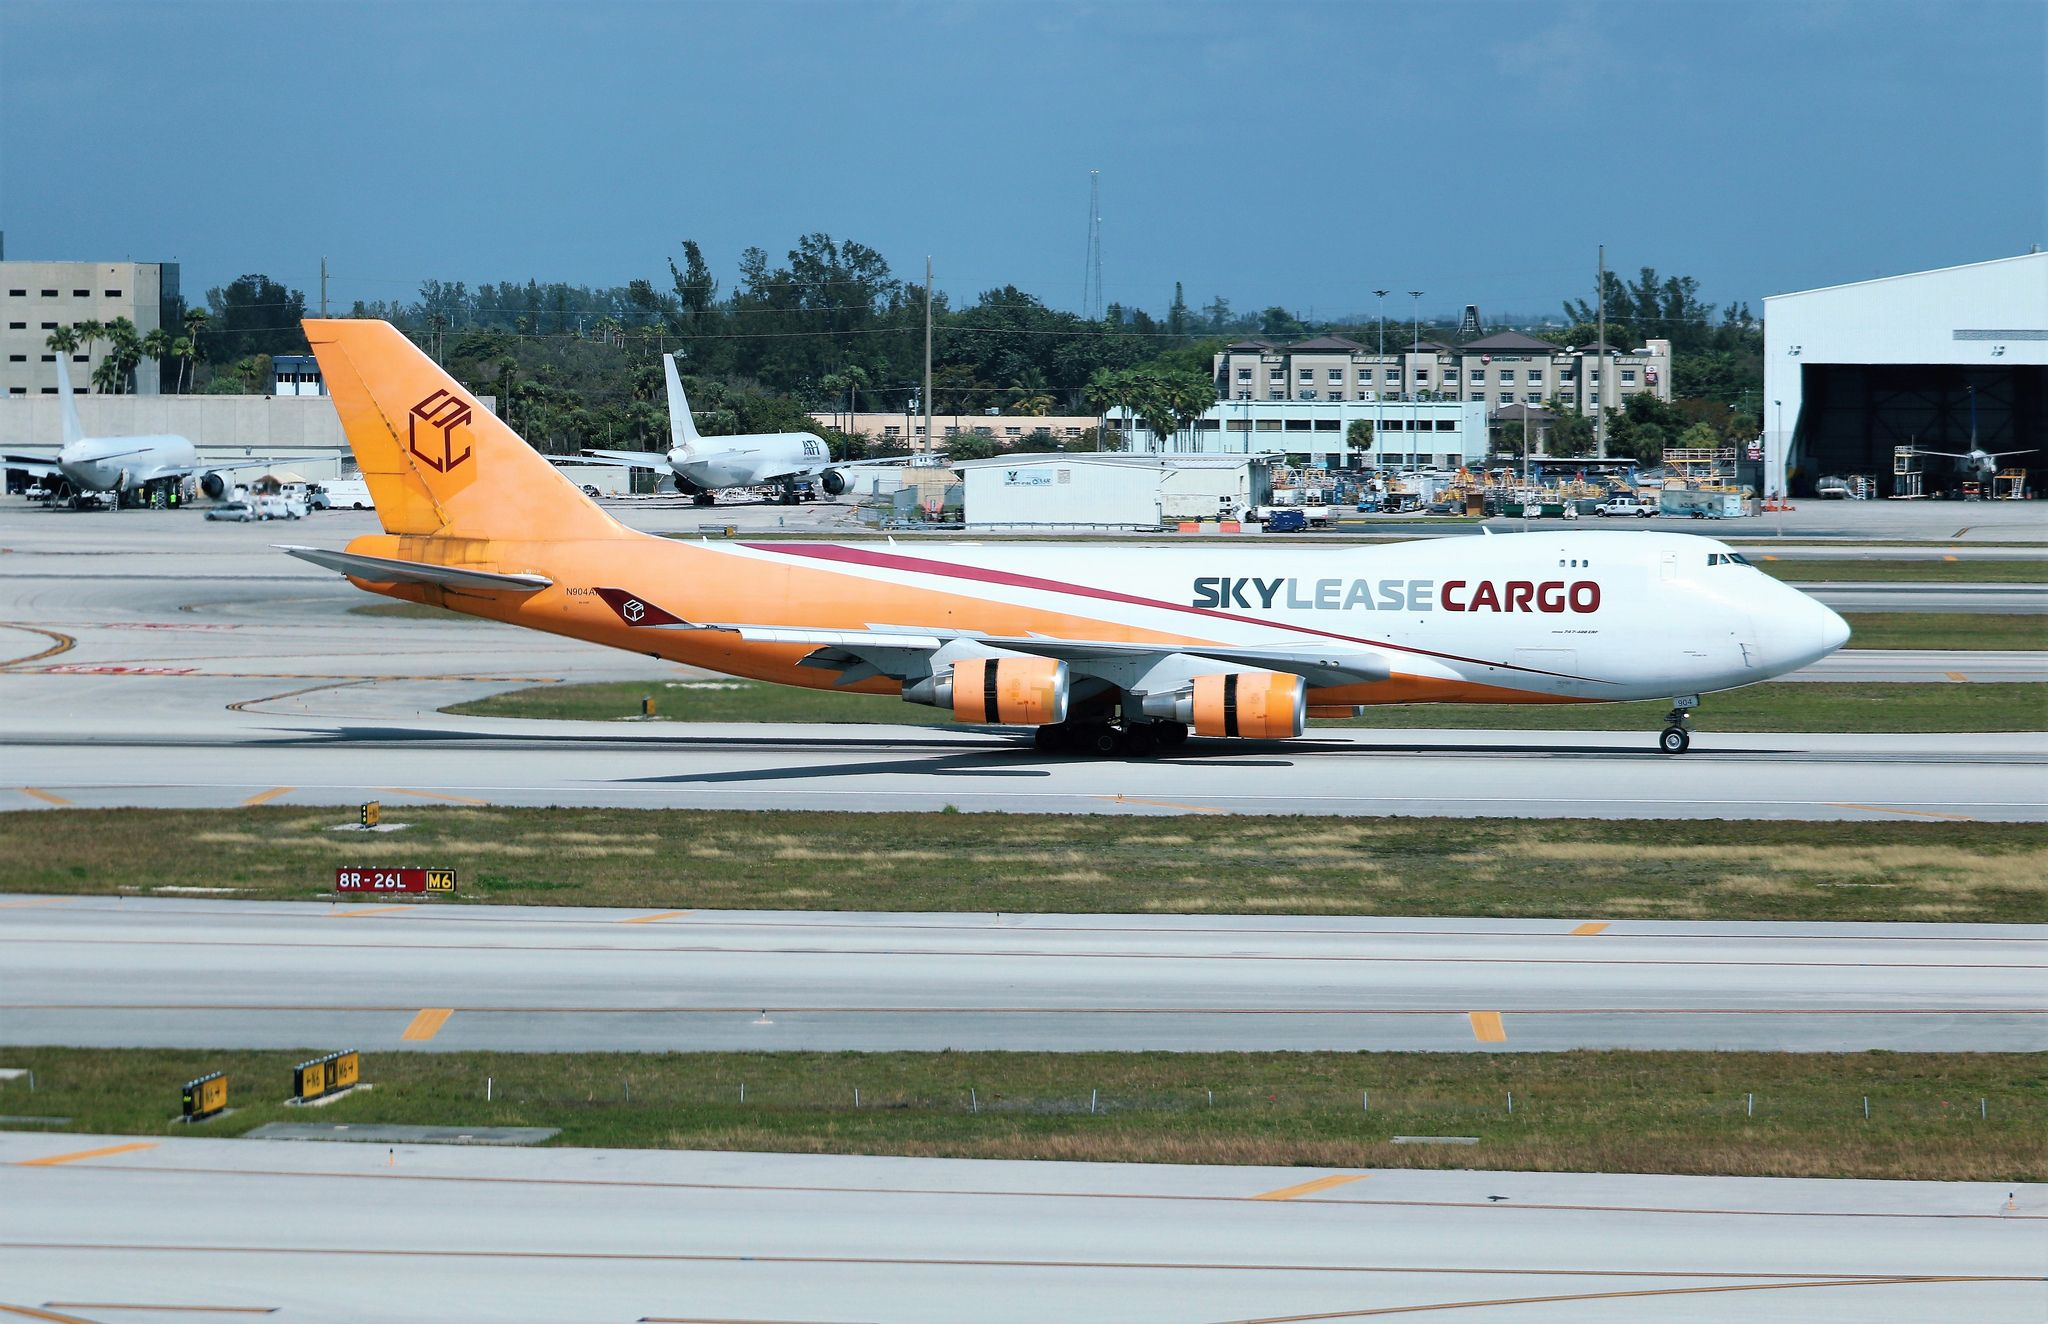 Sky Lease Cargo 747 Cargo airlines, Sky, Air france